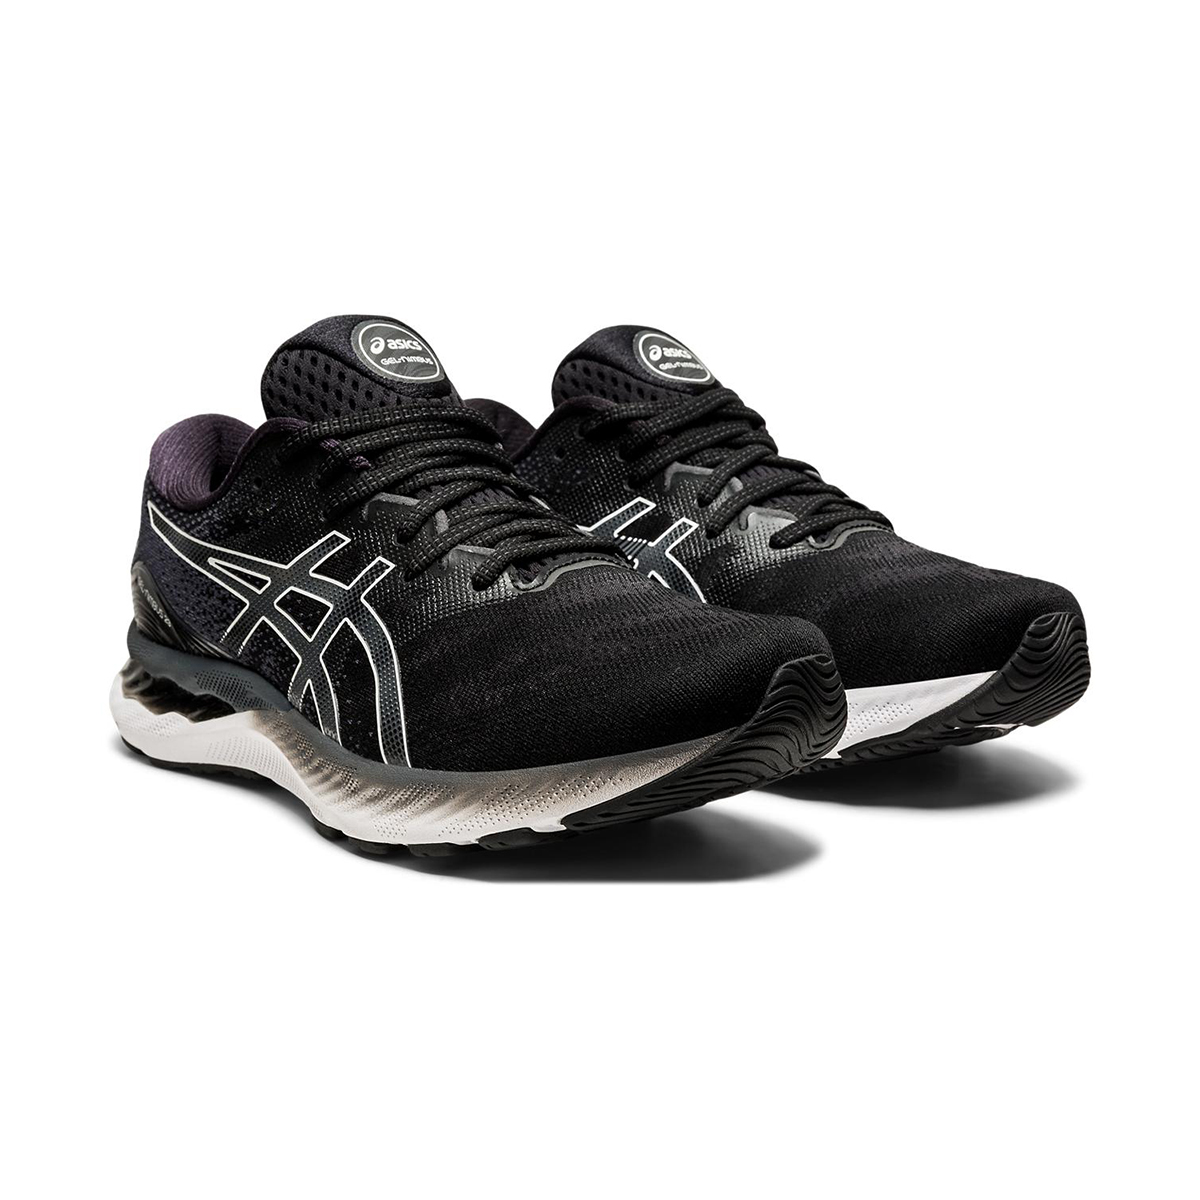 Men's Asics GEL-Nimbus 23 Running Shoe - Color: Black/White - Size: 7 - Width: Regular, Black/White, large, image 3